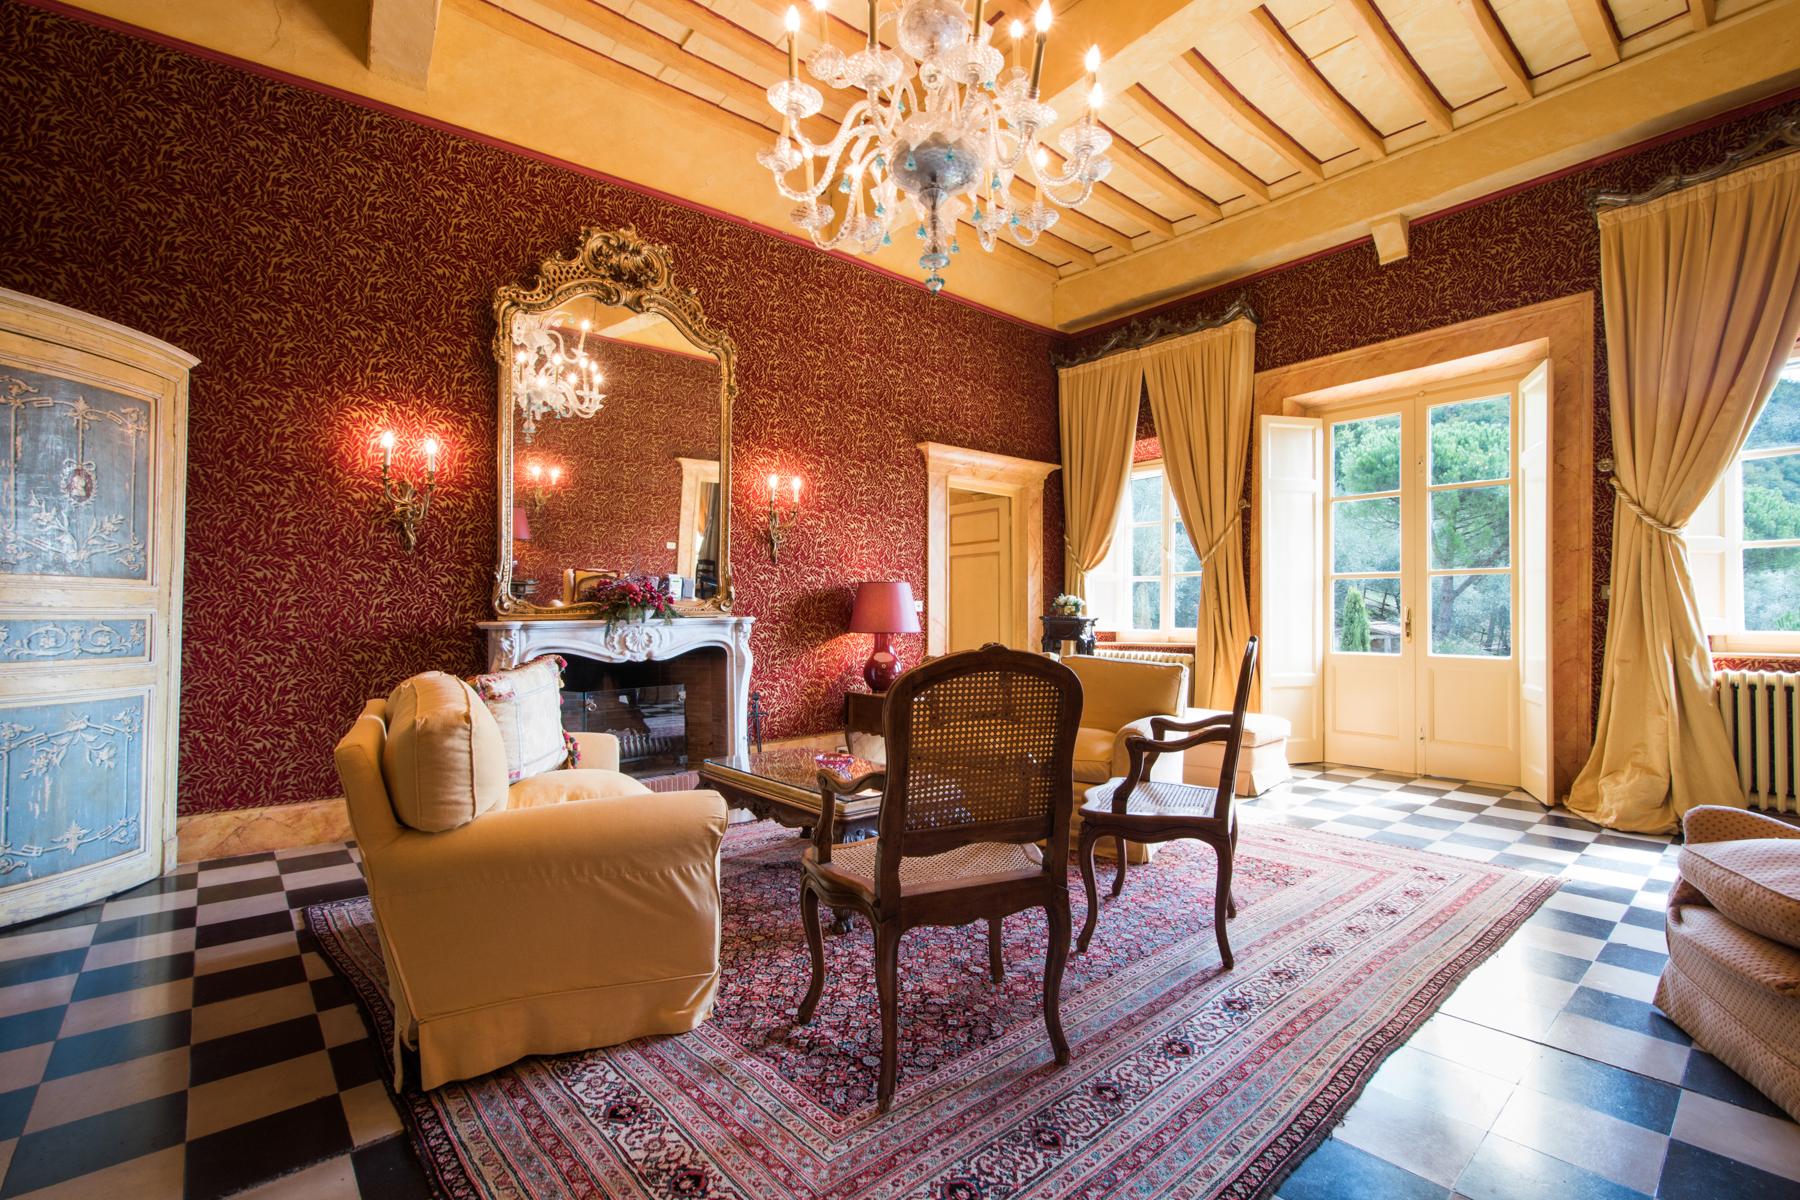 Villa in Vendita a Lucca: 5 locali, 1065 mq - Foto 7